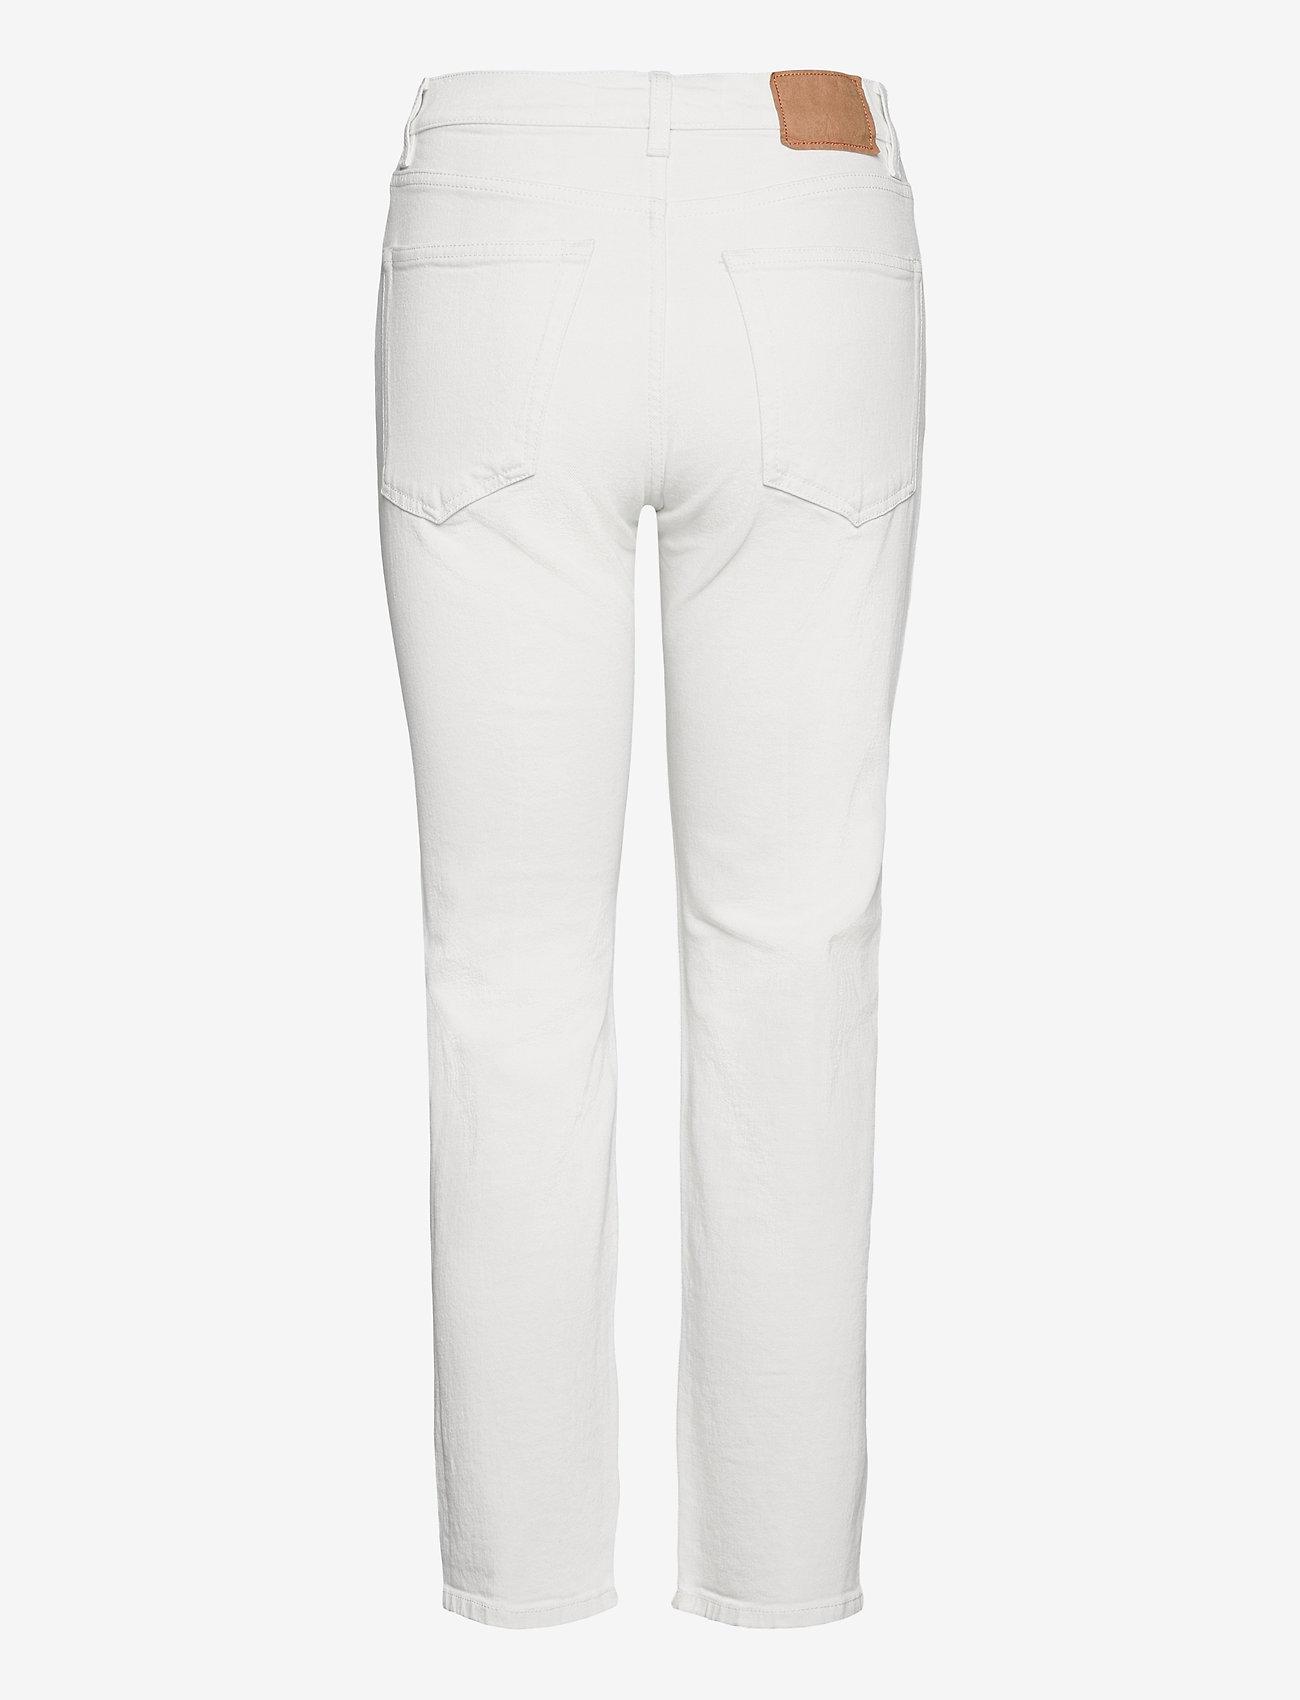 Jeanerica - CW002 - straight regular - natural white - 2